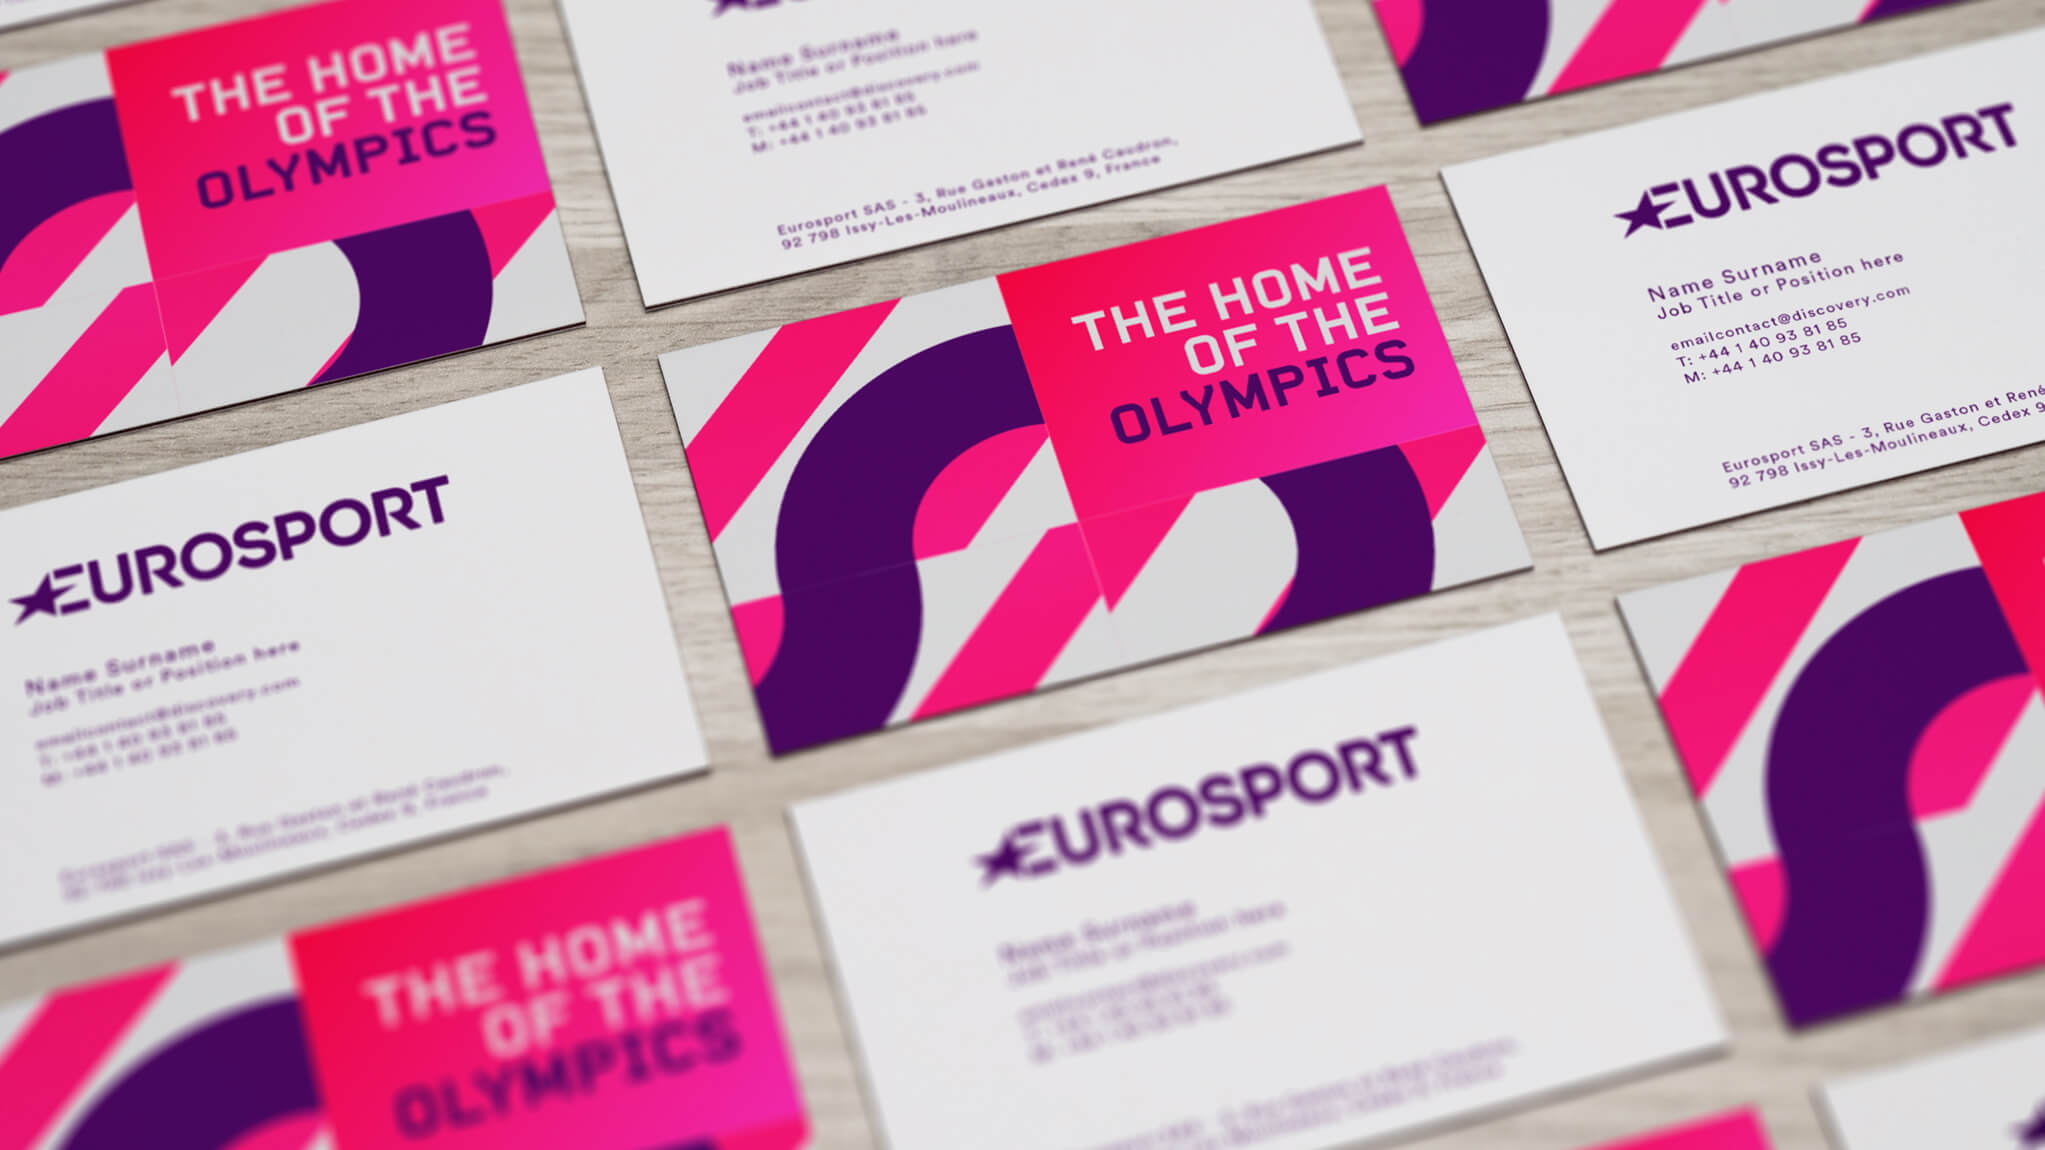 EUROSPORT20170508_006